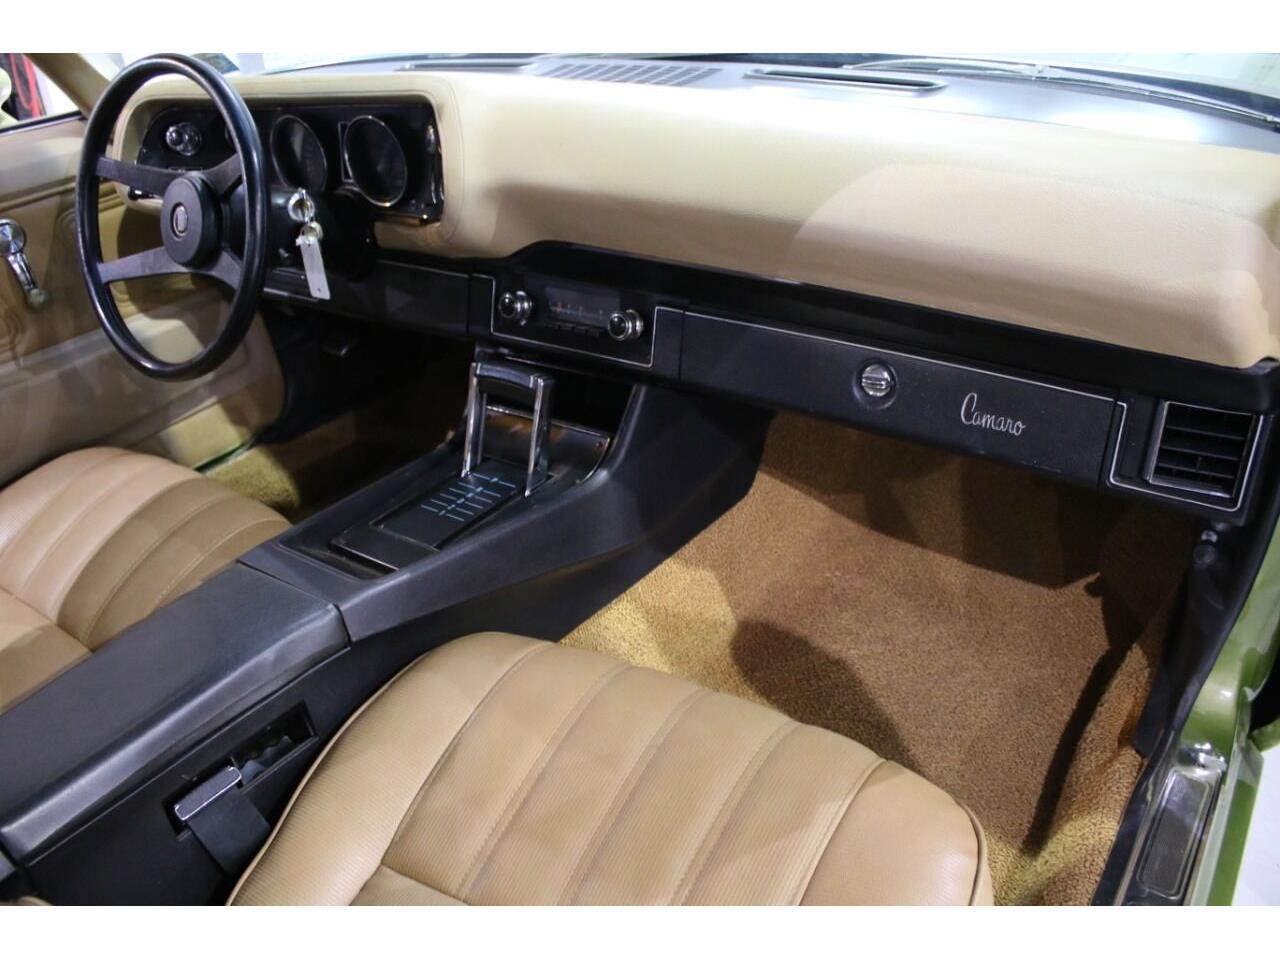 1971 Chevrolet Camaro (CC-1393211) for sale in Hilton, New York